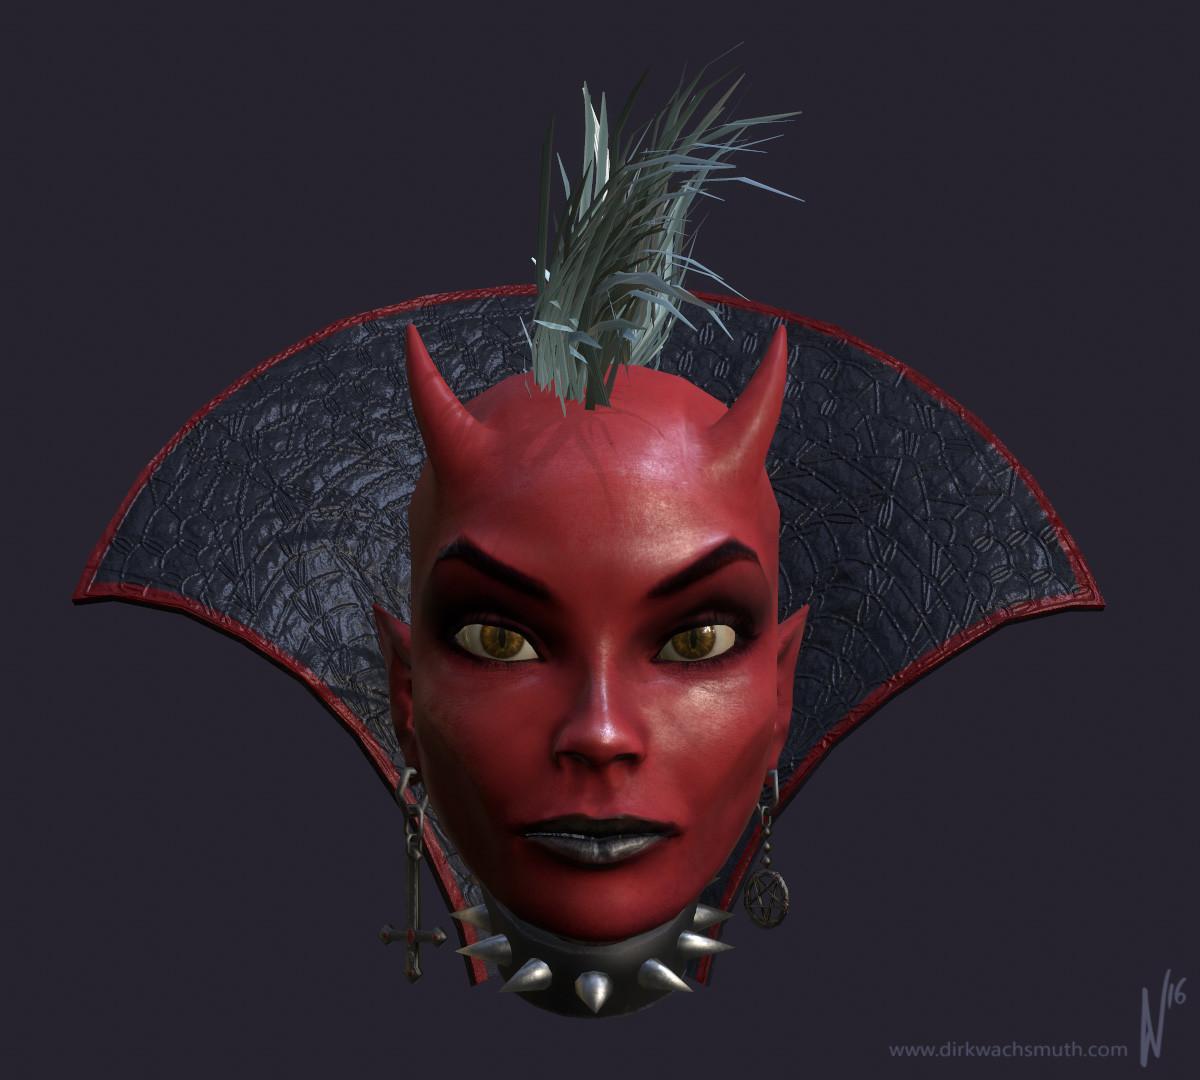 Dirk wachsmuth devil girl 05